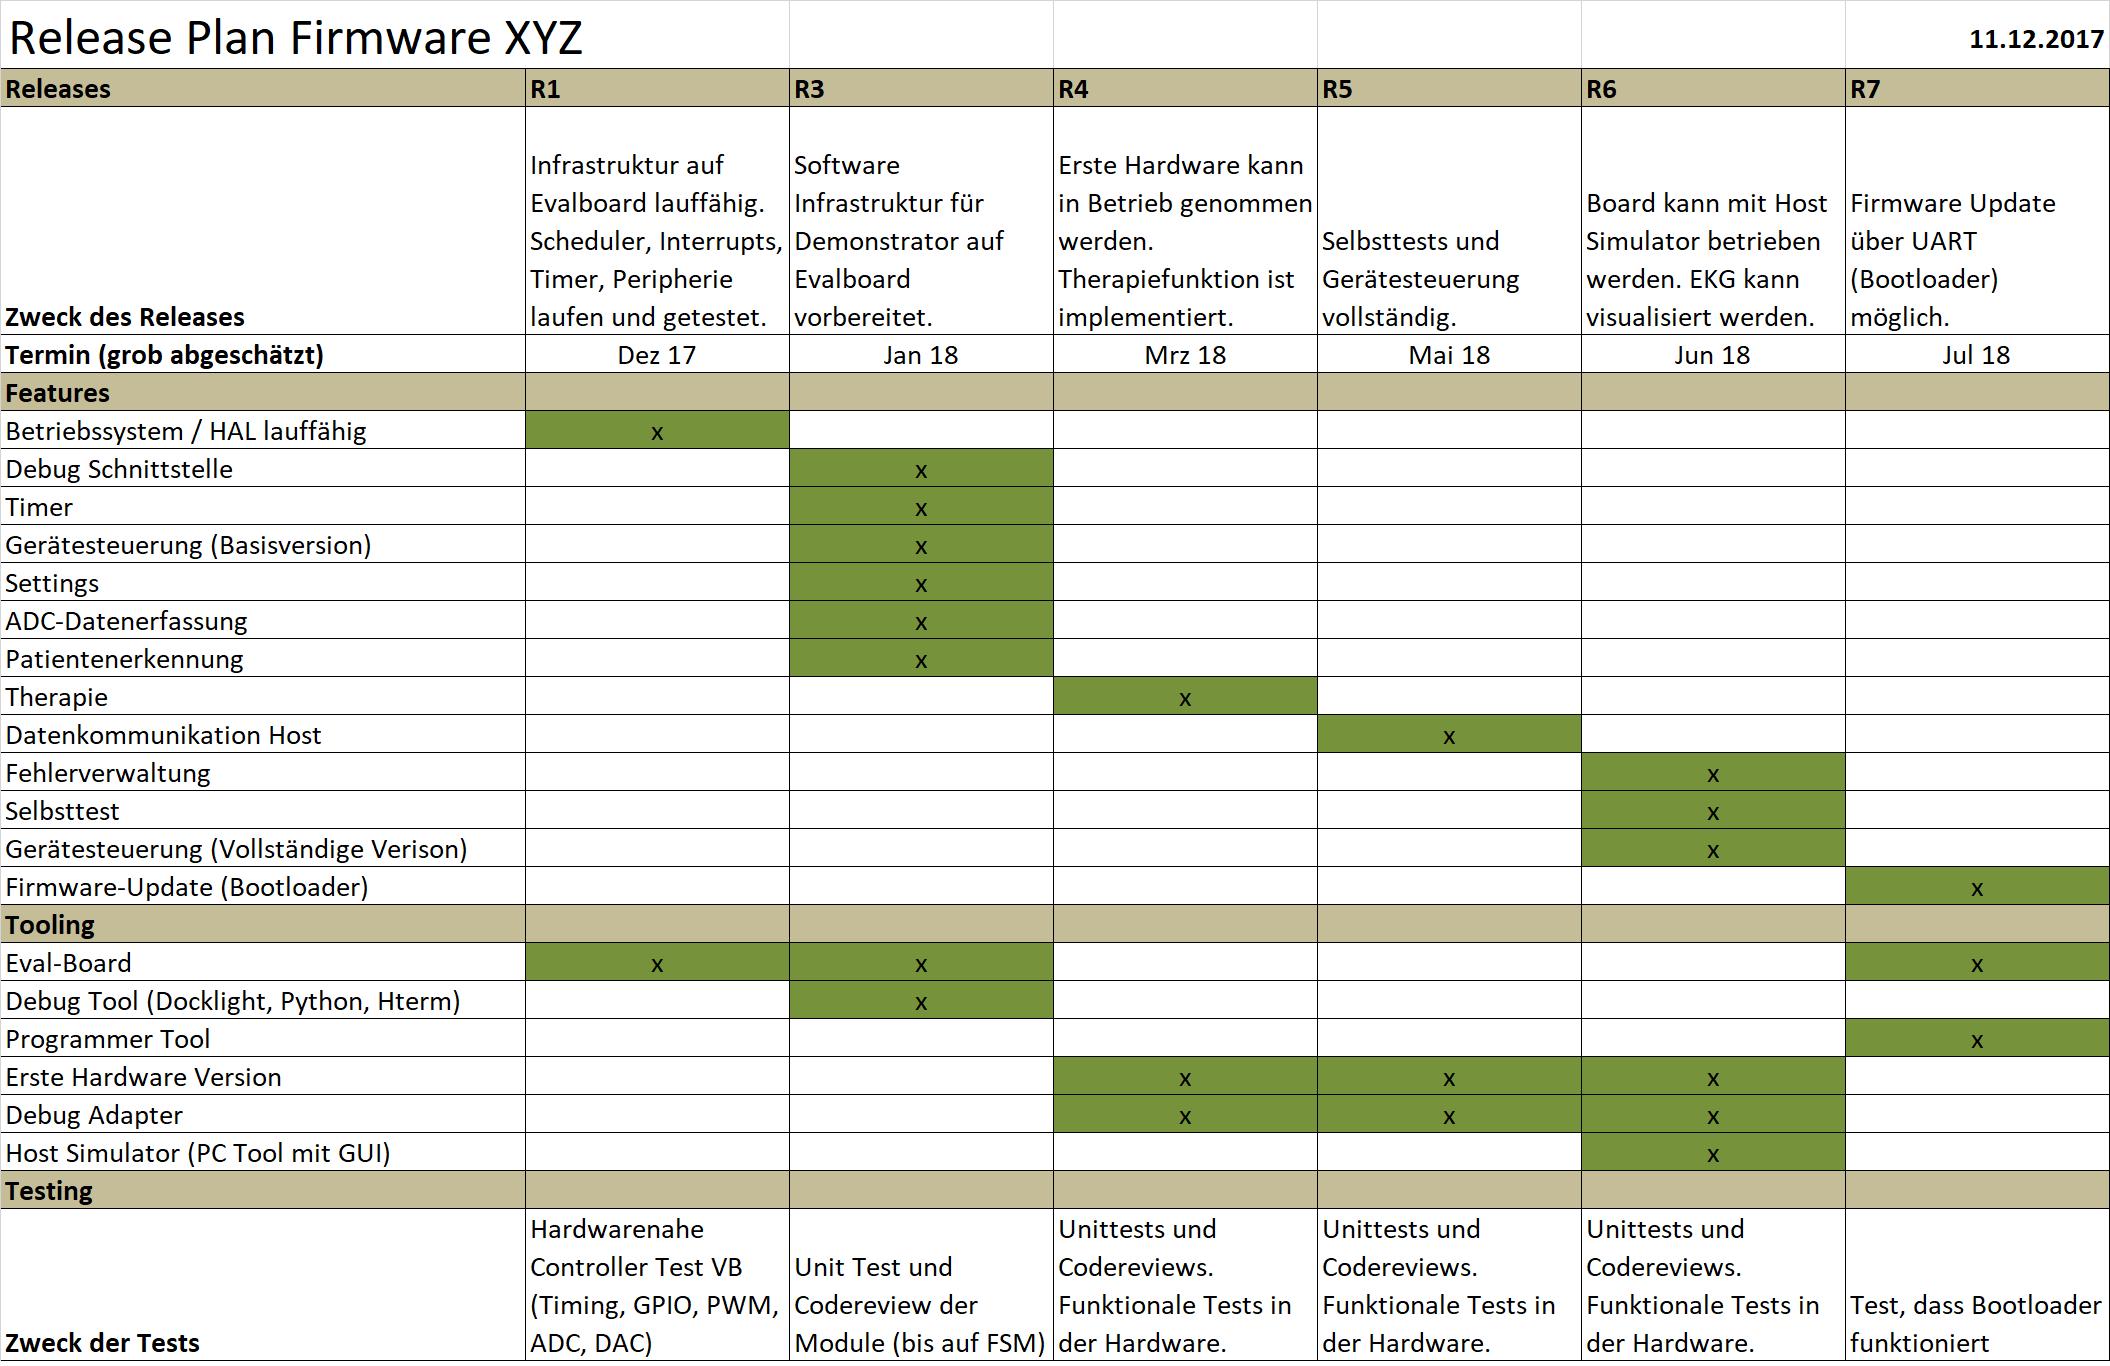 Fein Bedeutung Des Blockdiagramms Ideen - Der Schaltplan - triangre.info